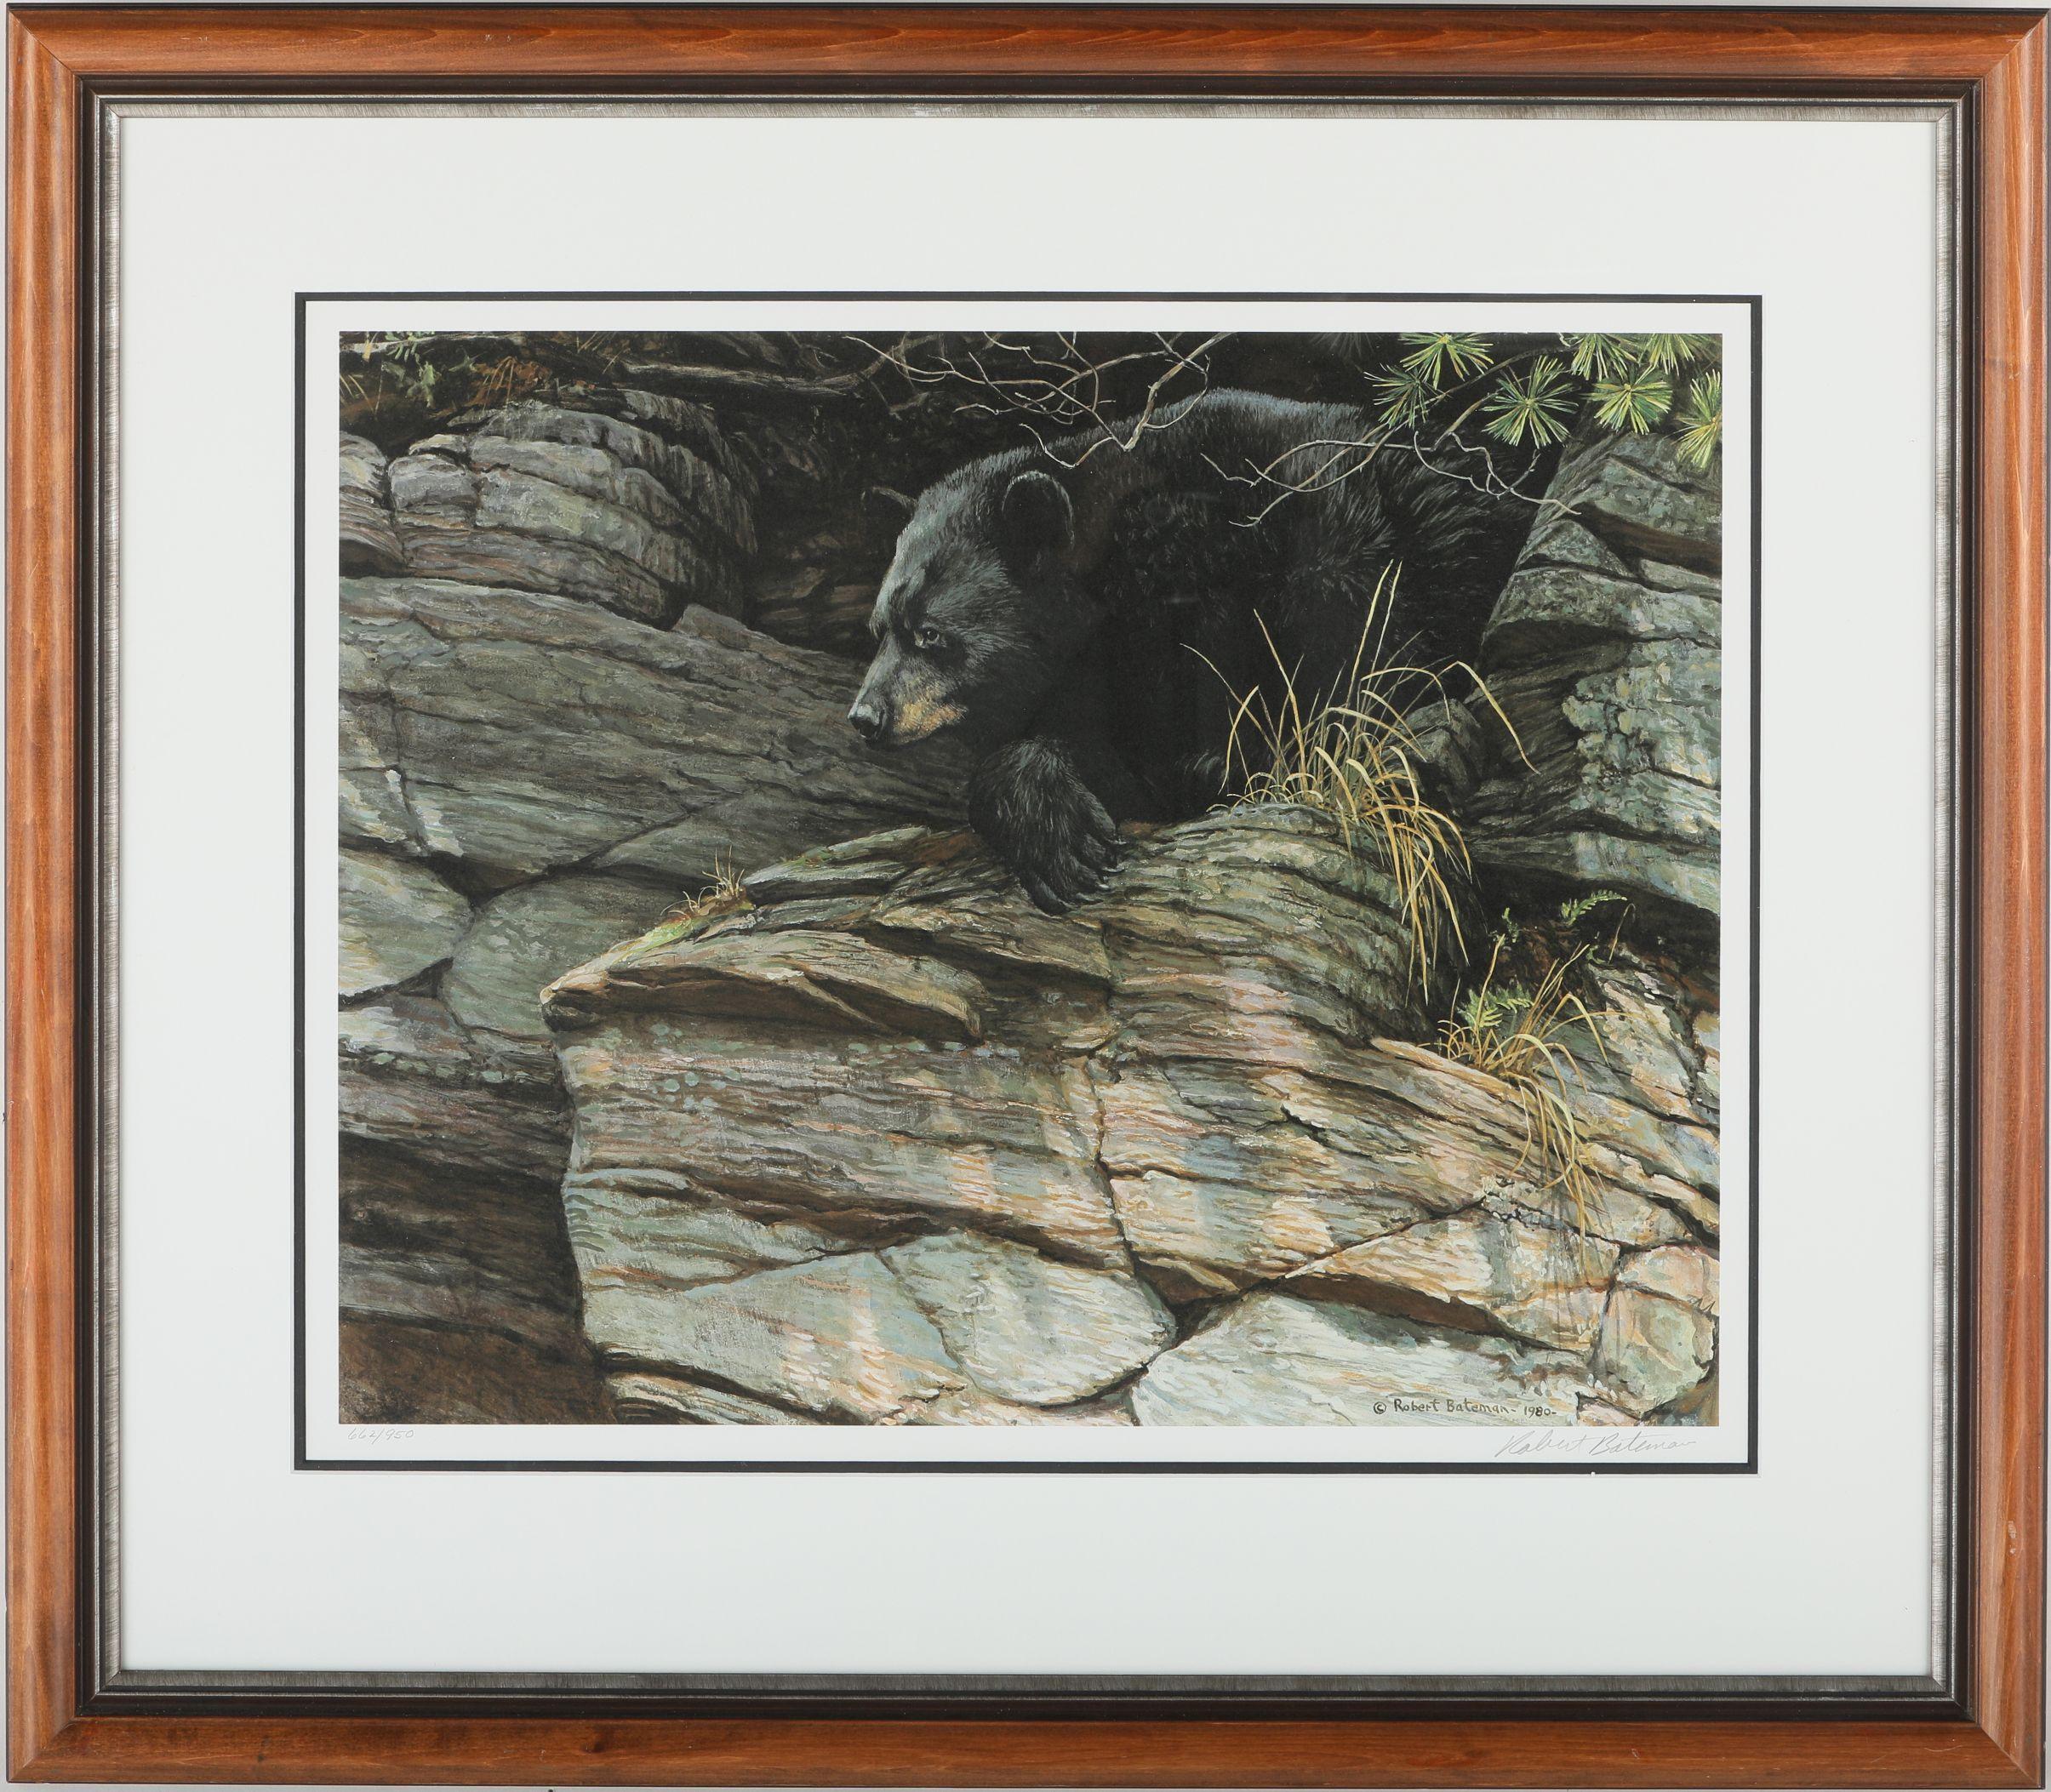 "Robert Bateman's ""Black Bear Repose"" Limited Edition Print"